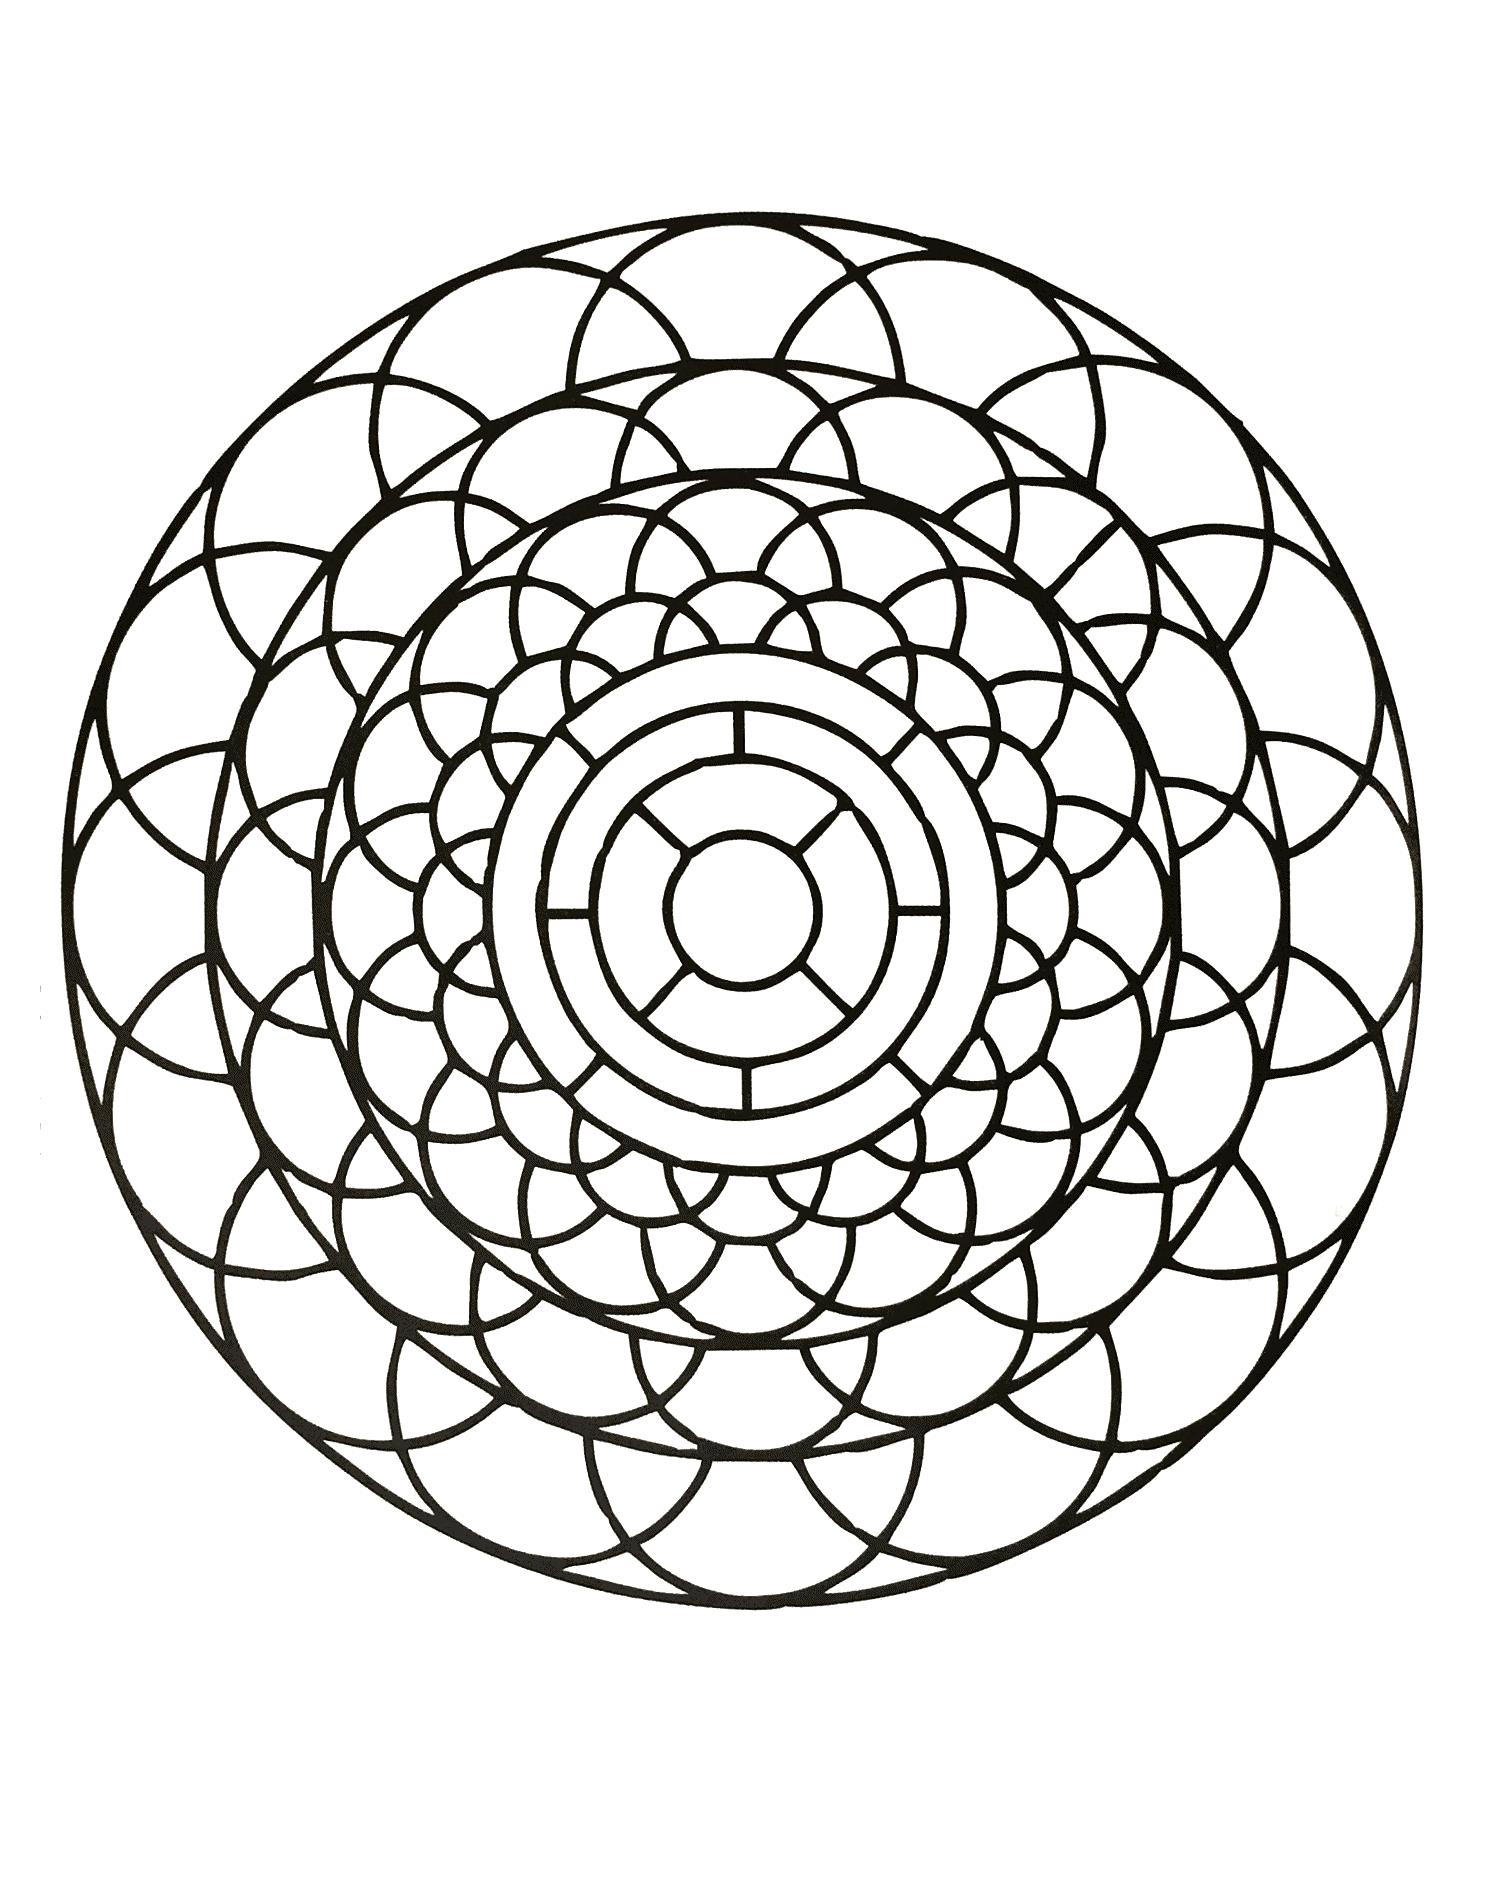 Simple mandala 84 - Mandalas Coloring pages for kids to ...